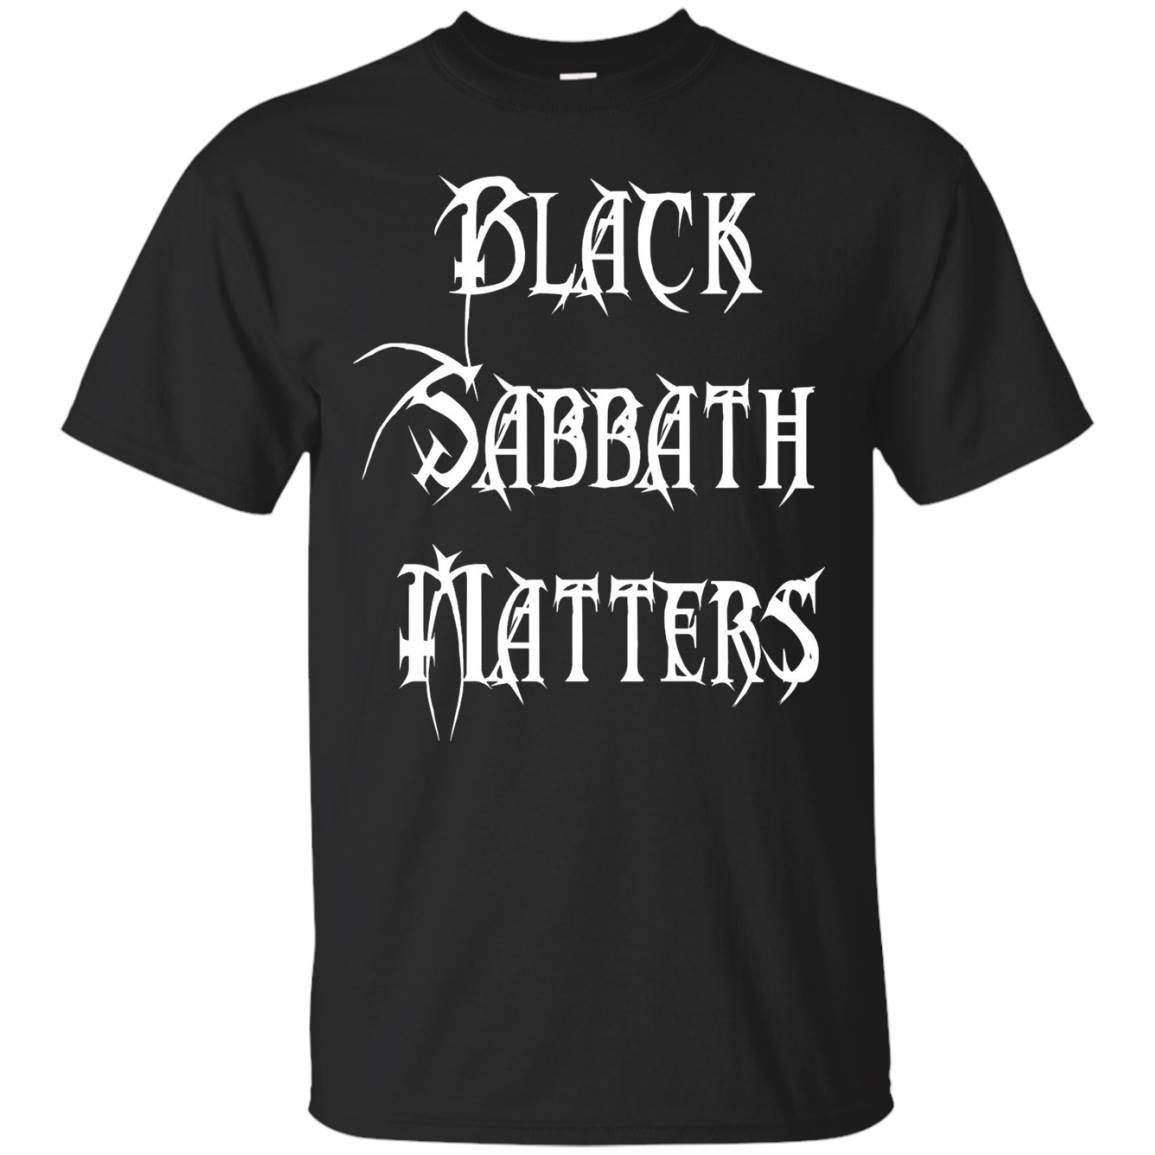 Black Sabbath Matters T-Shirt